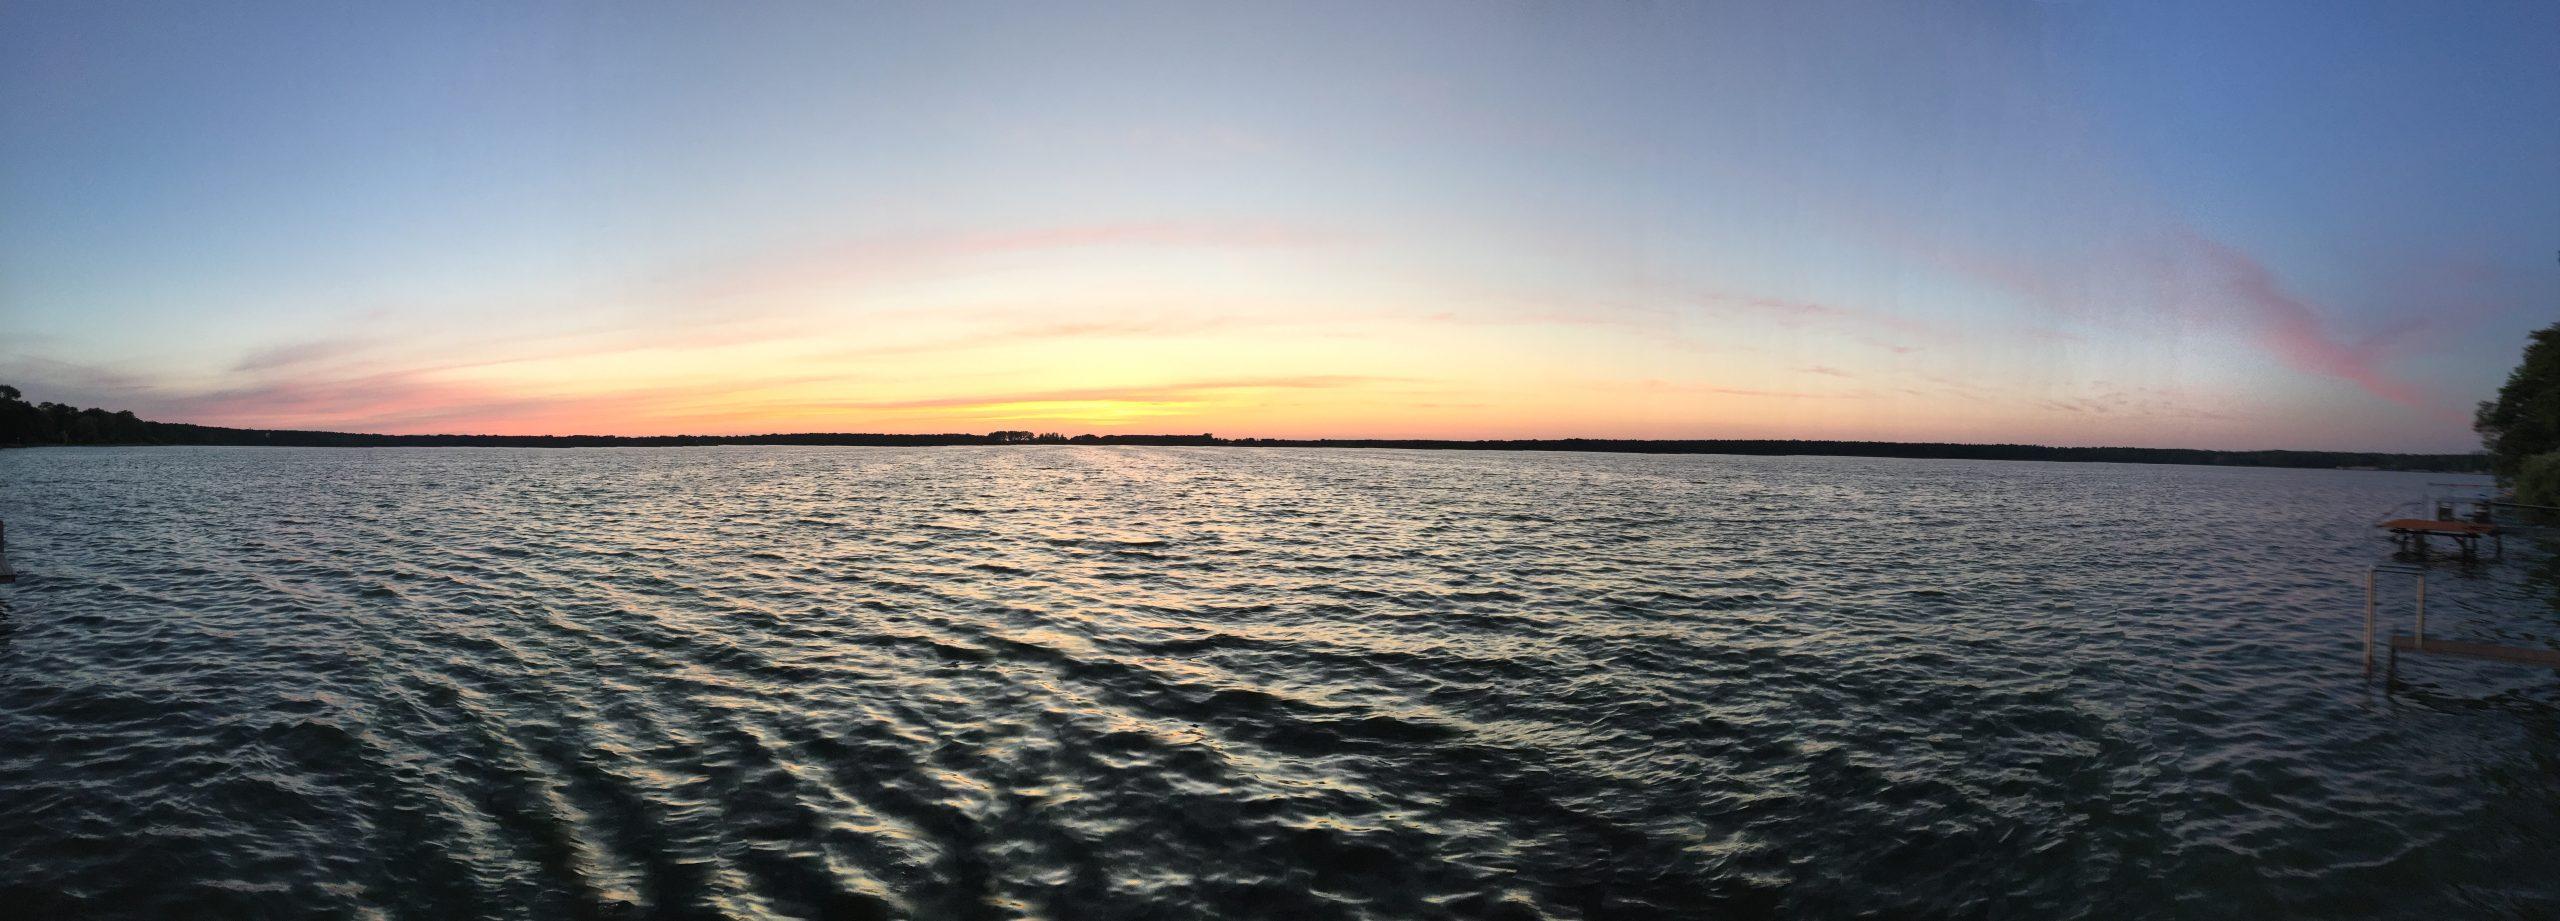 Arendsee bei Sonnenuntergang